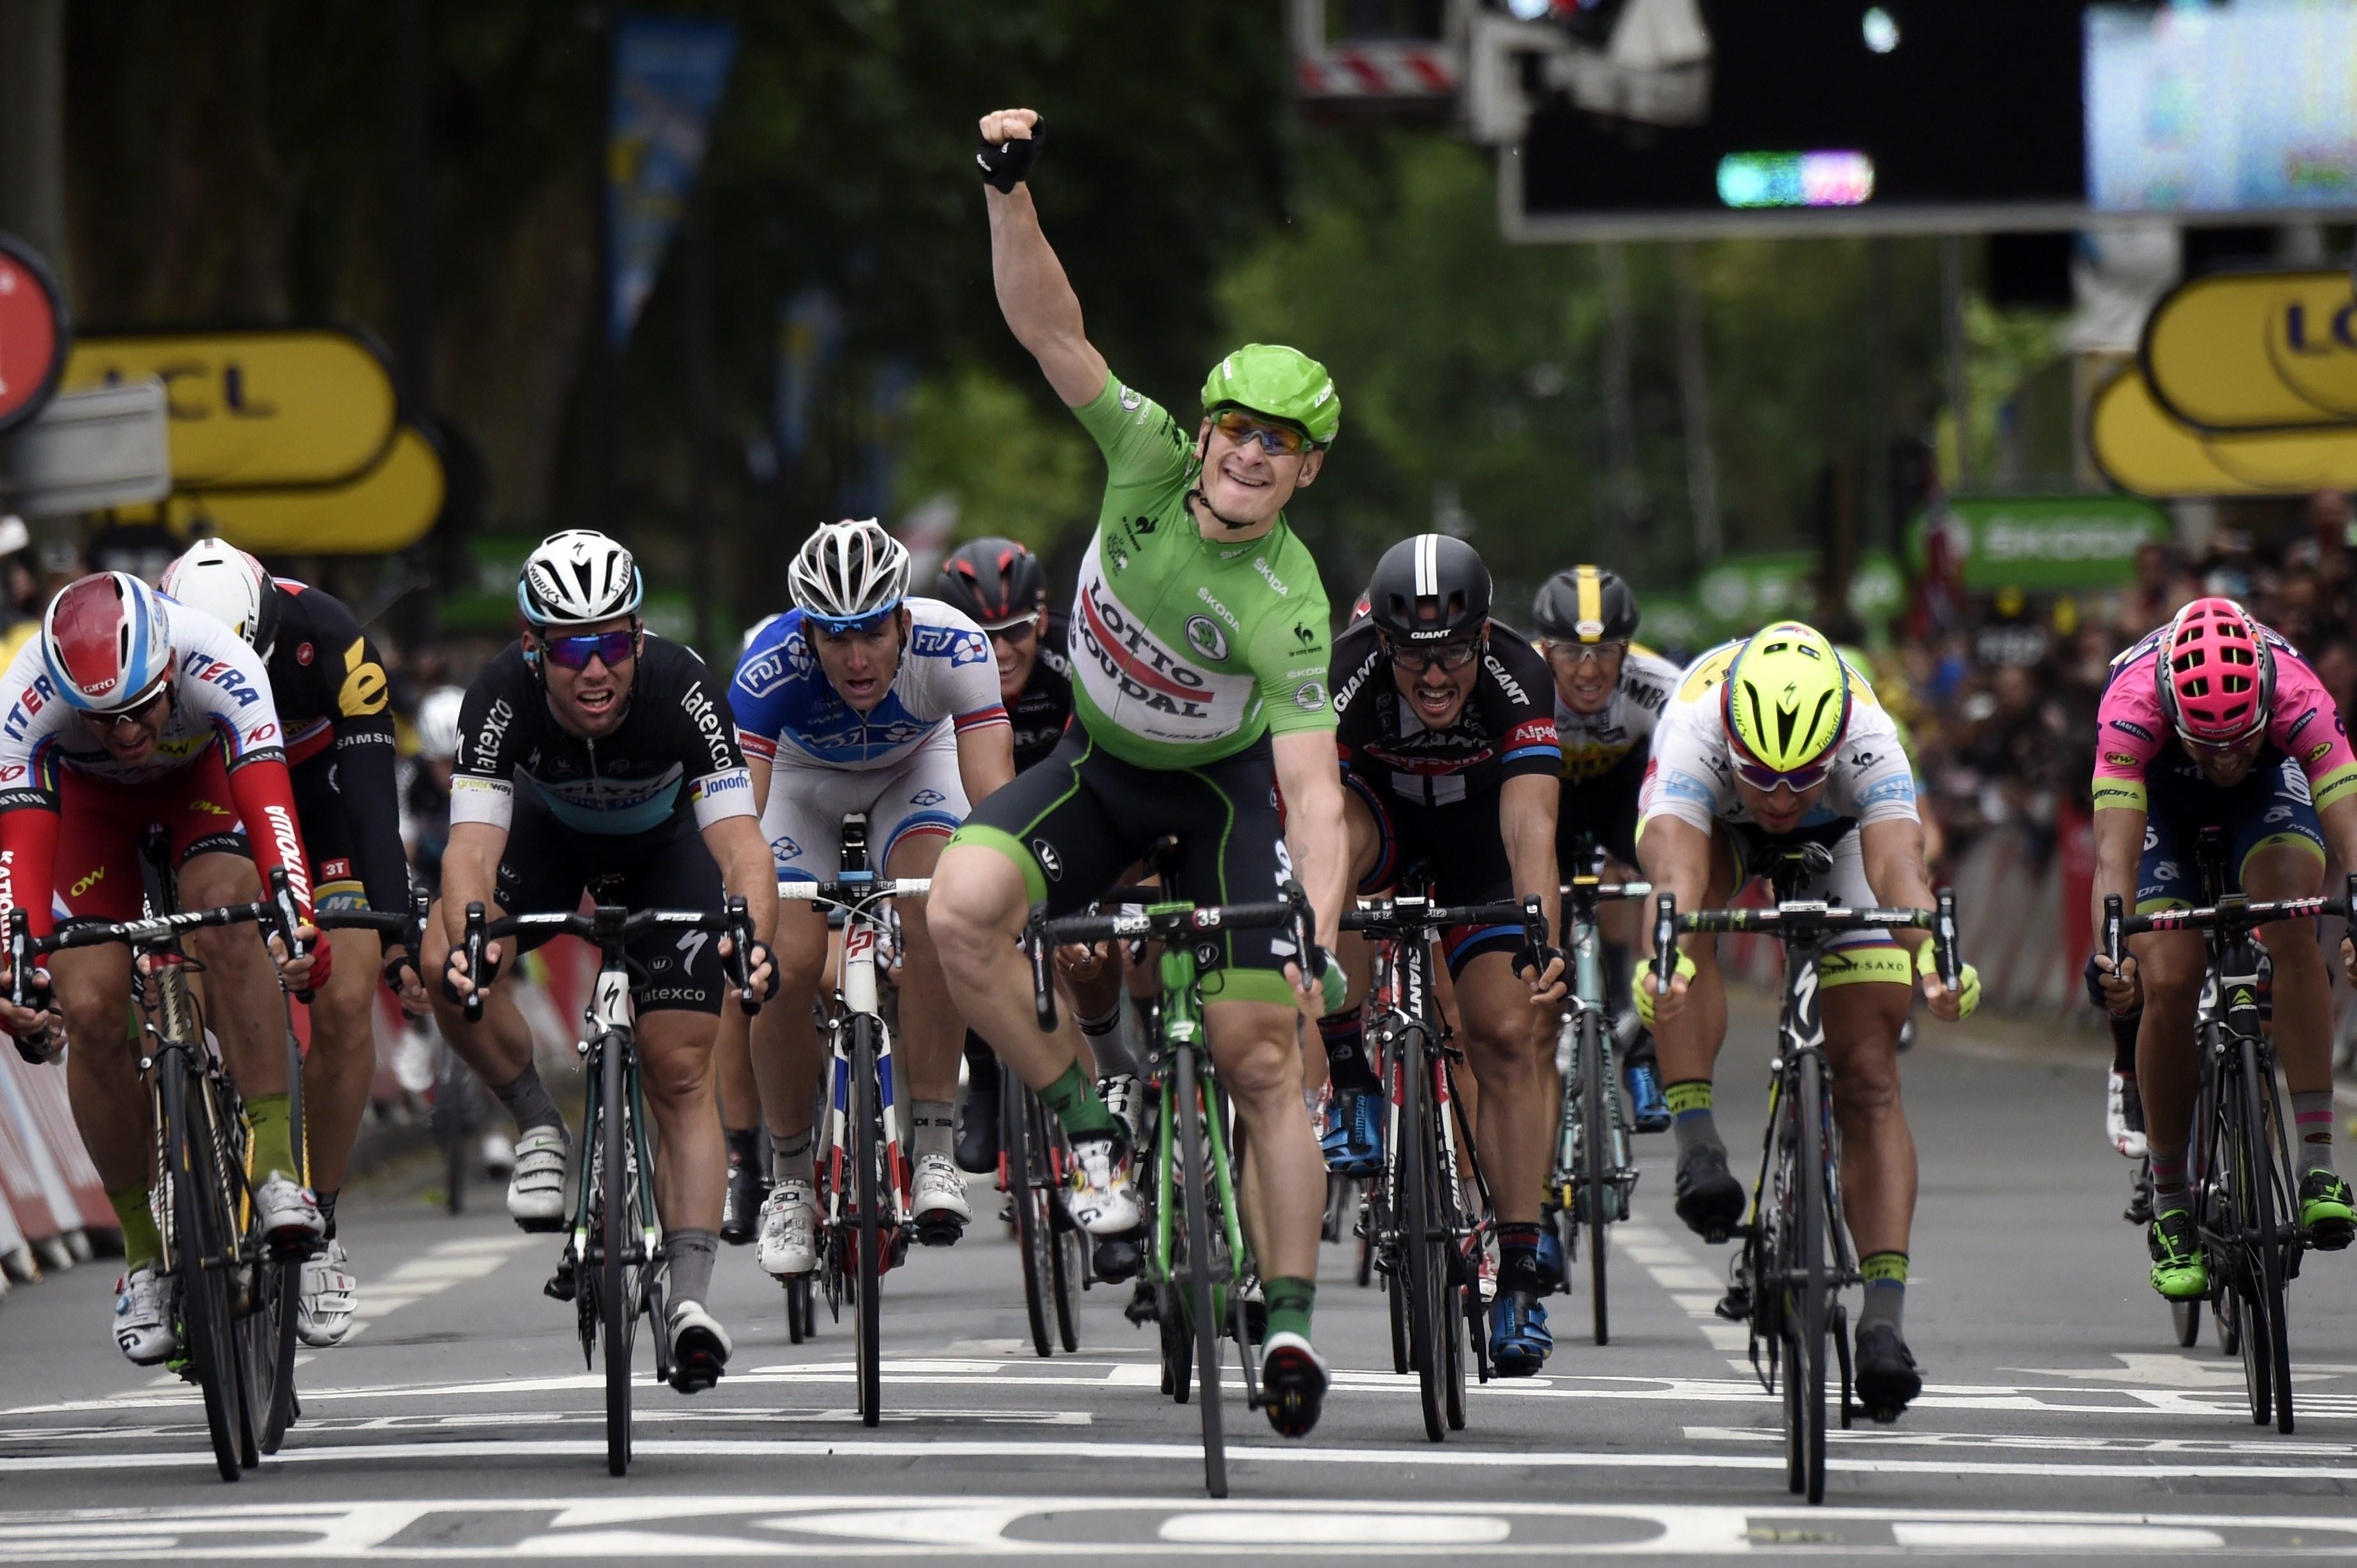 Greipel had time to celebrate, crossing the line ahead of Sagan's bike throw.